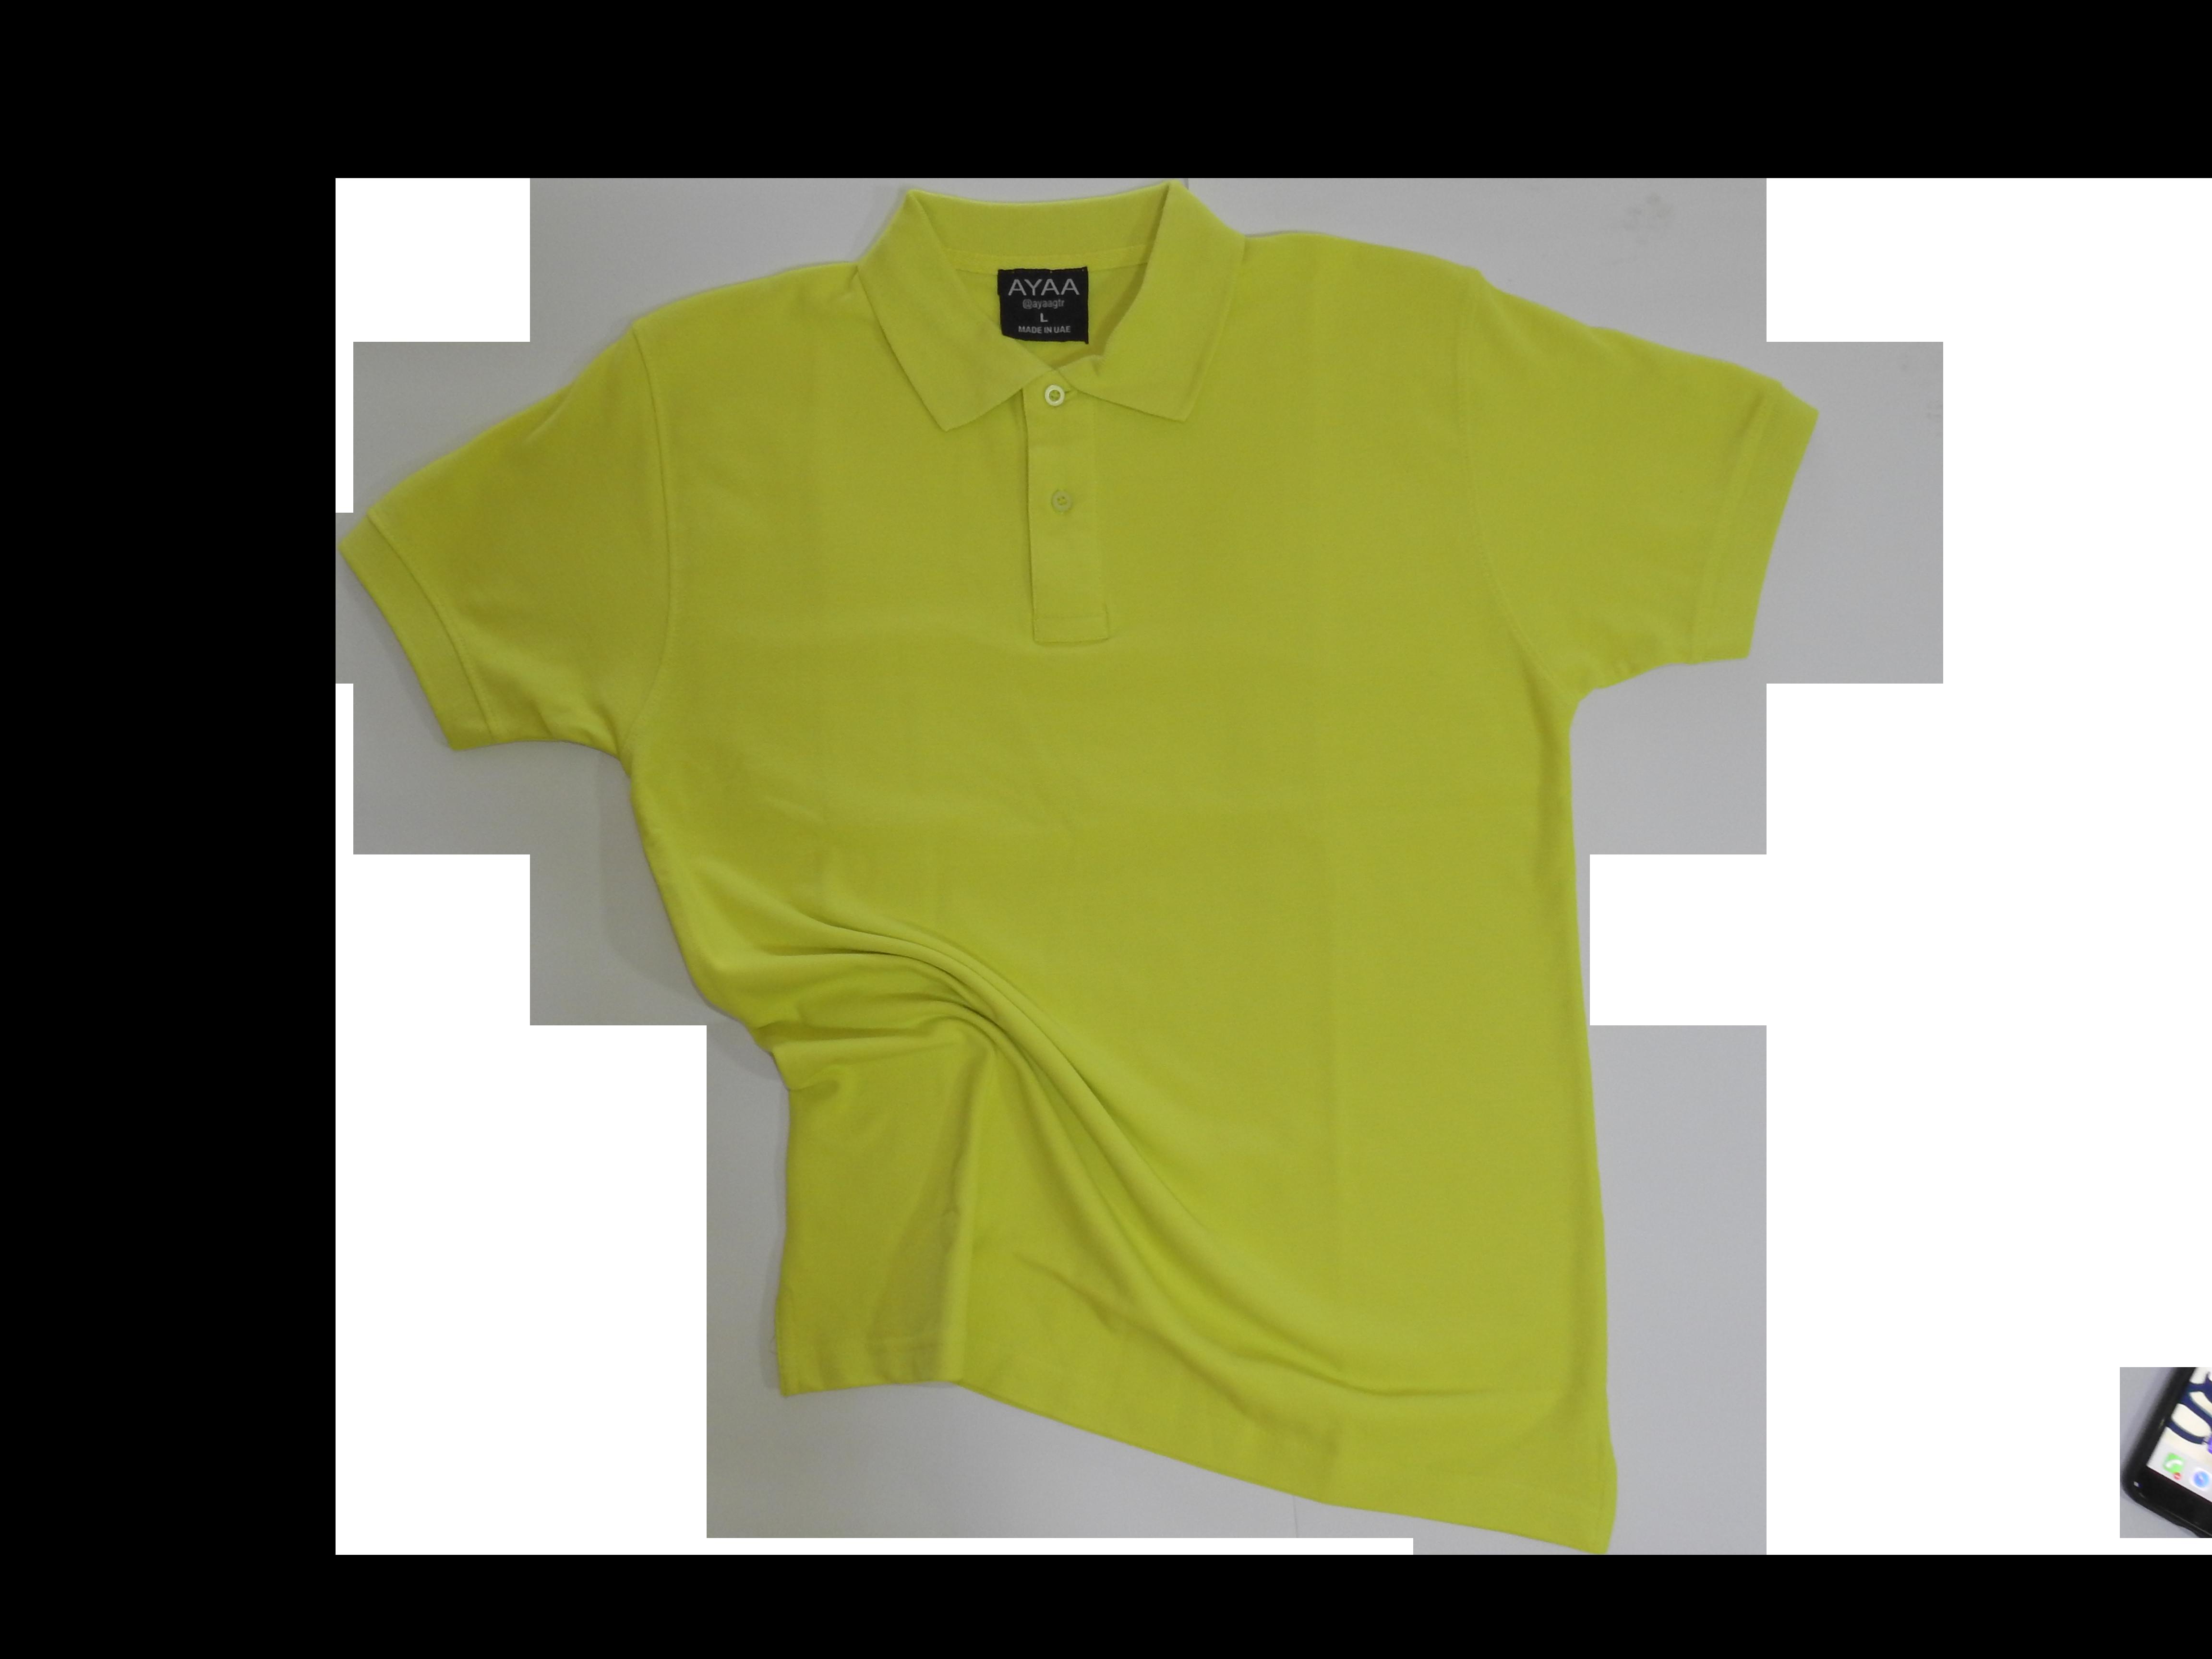 Blank polo t-shirts